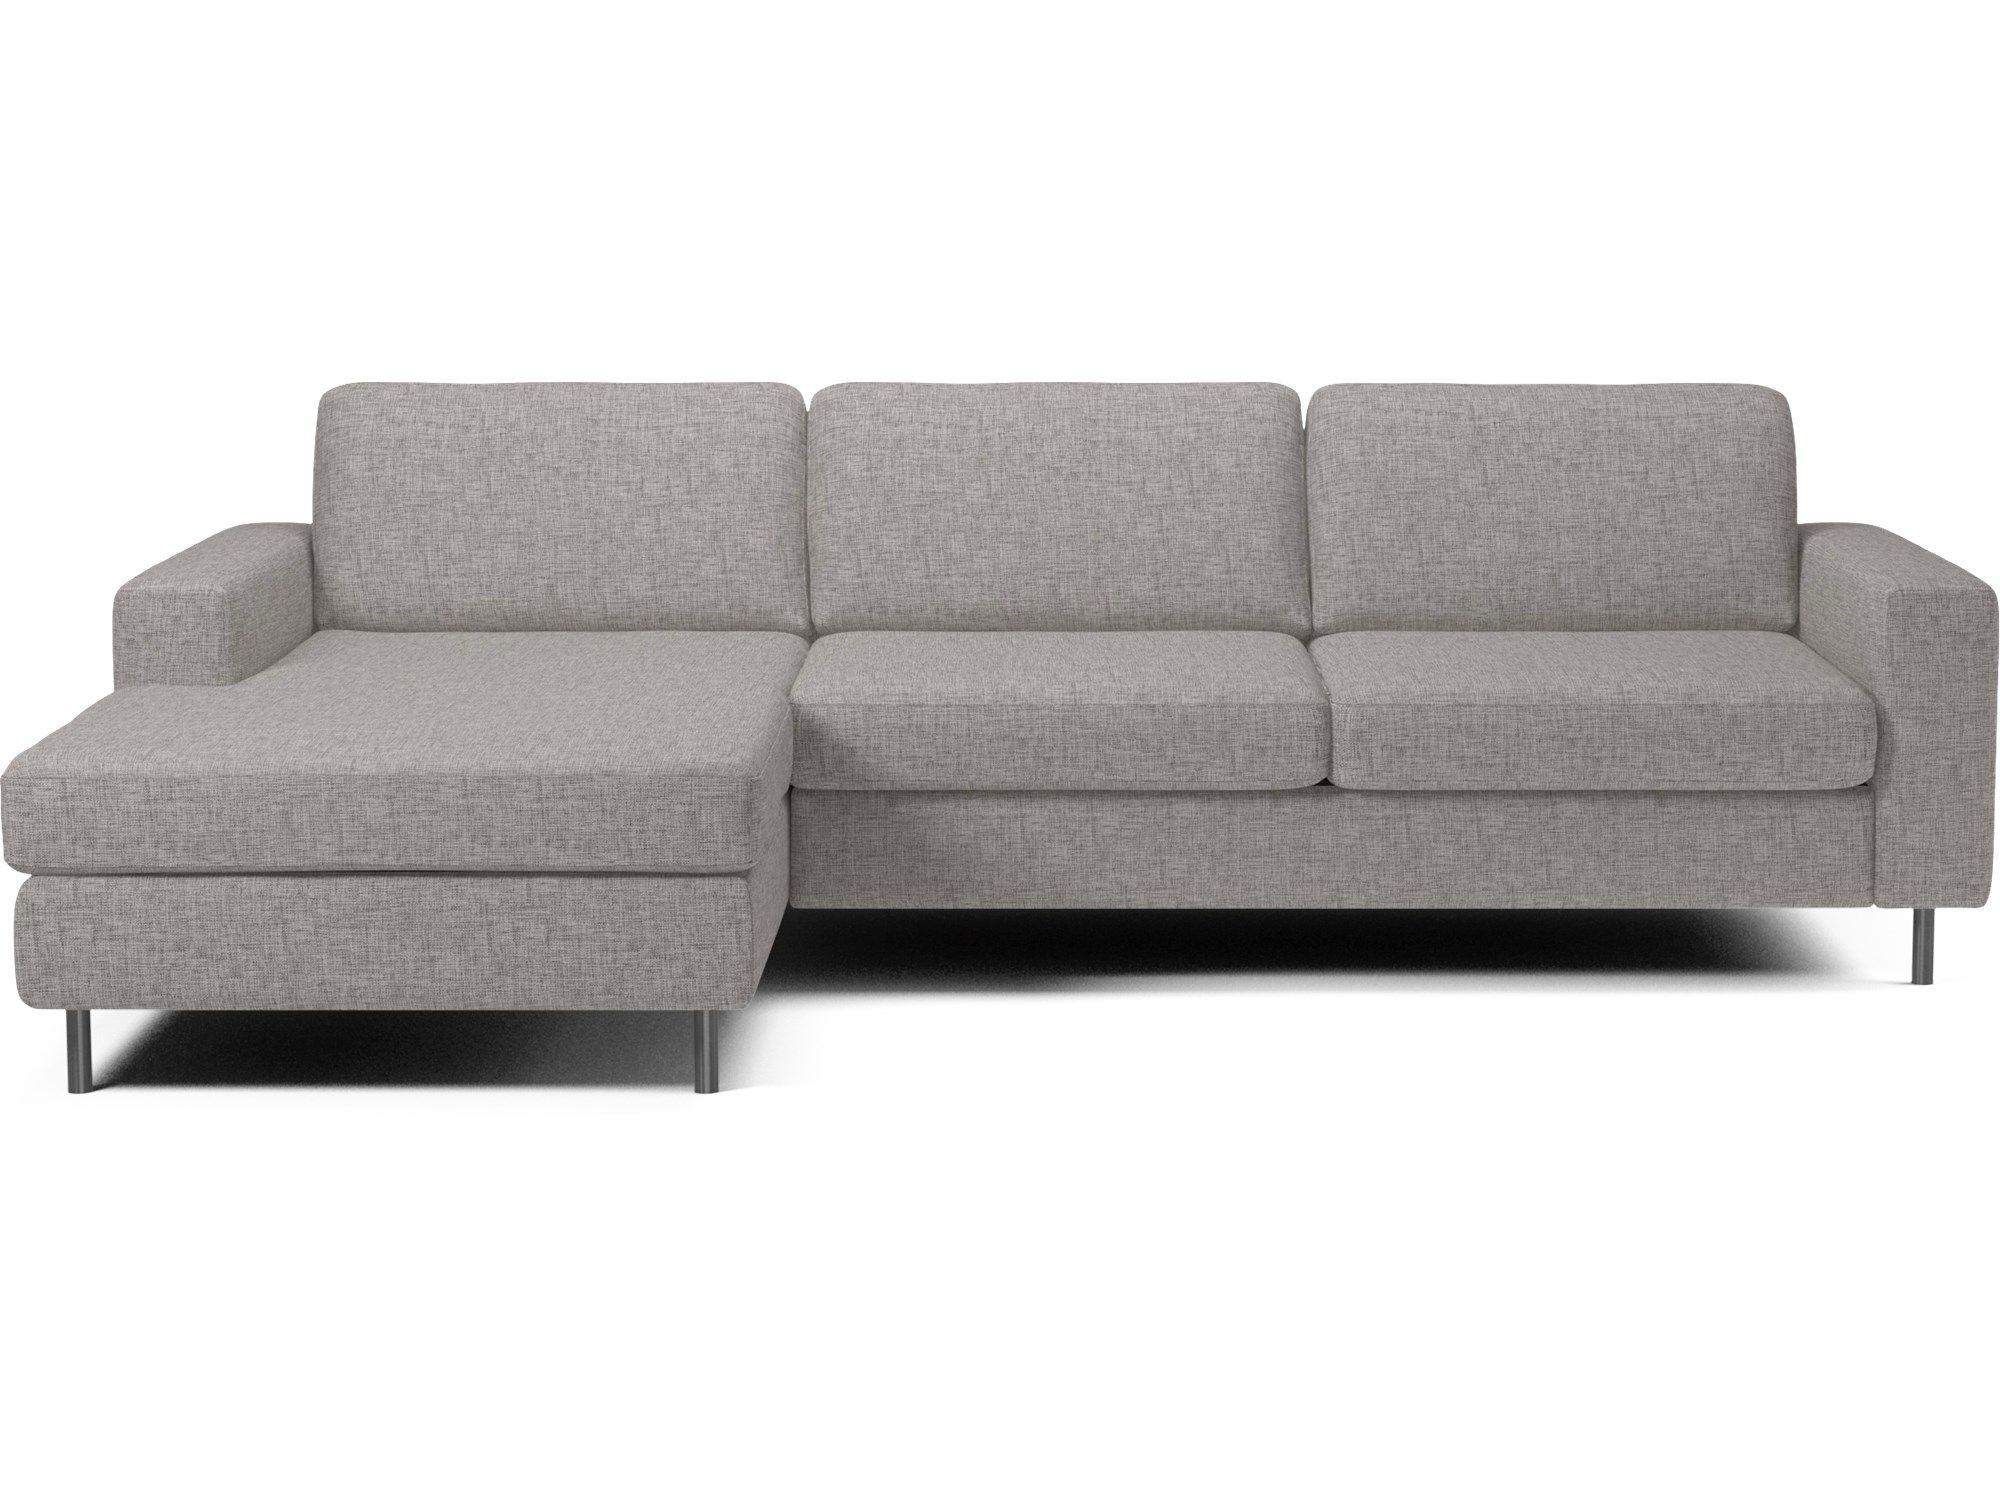 Scandinavia 3 pers. sofa med Sjeselong venstre Glismand ...